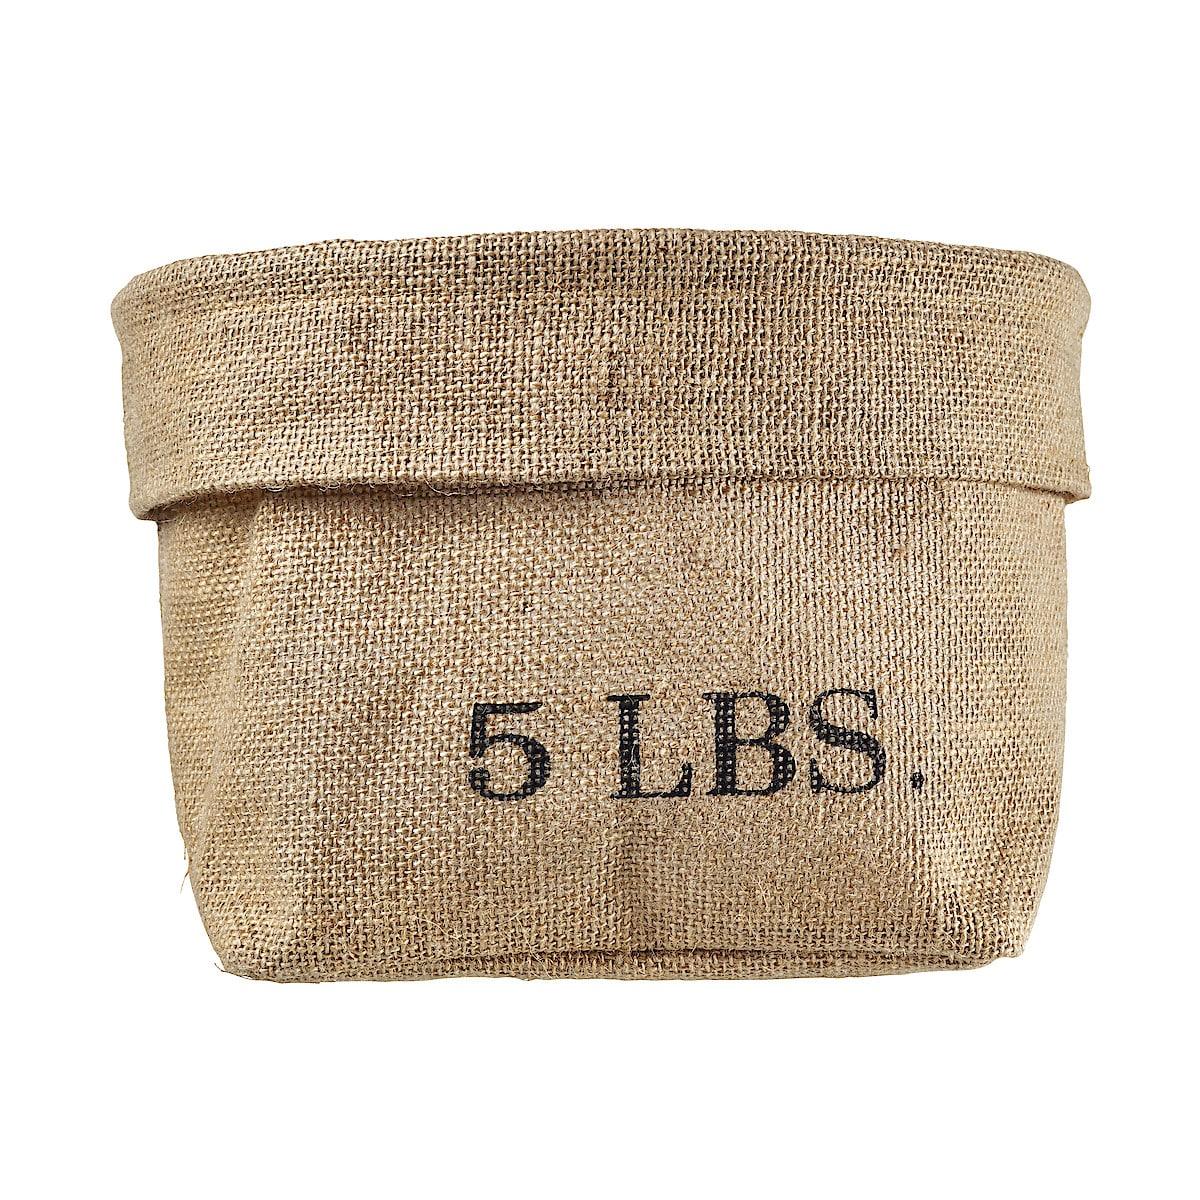 Korg 5 lbs